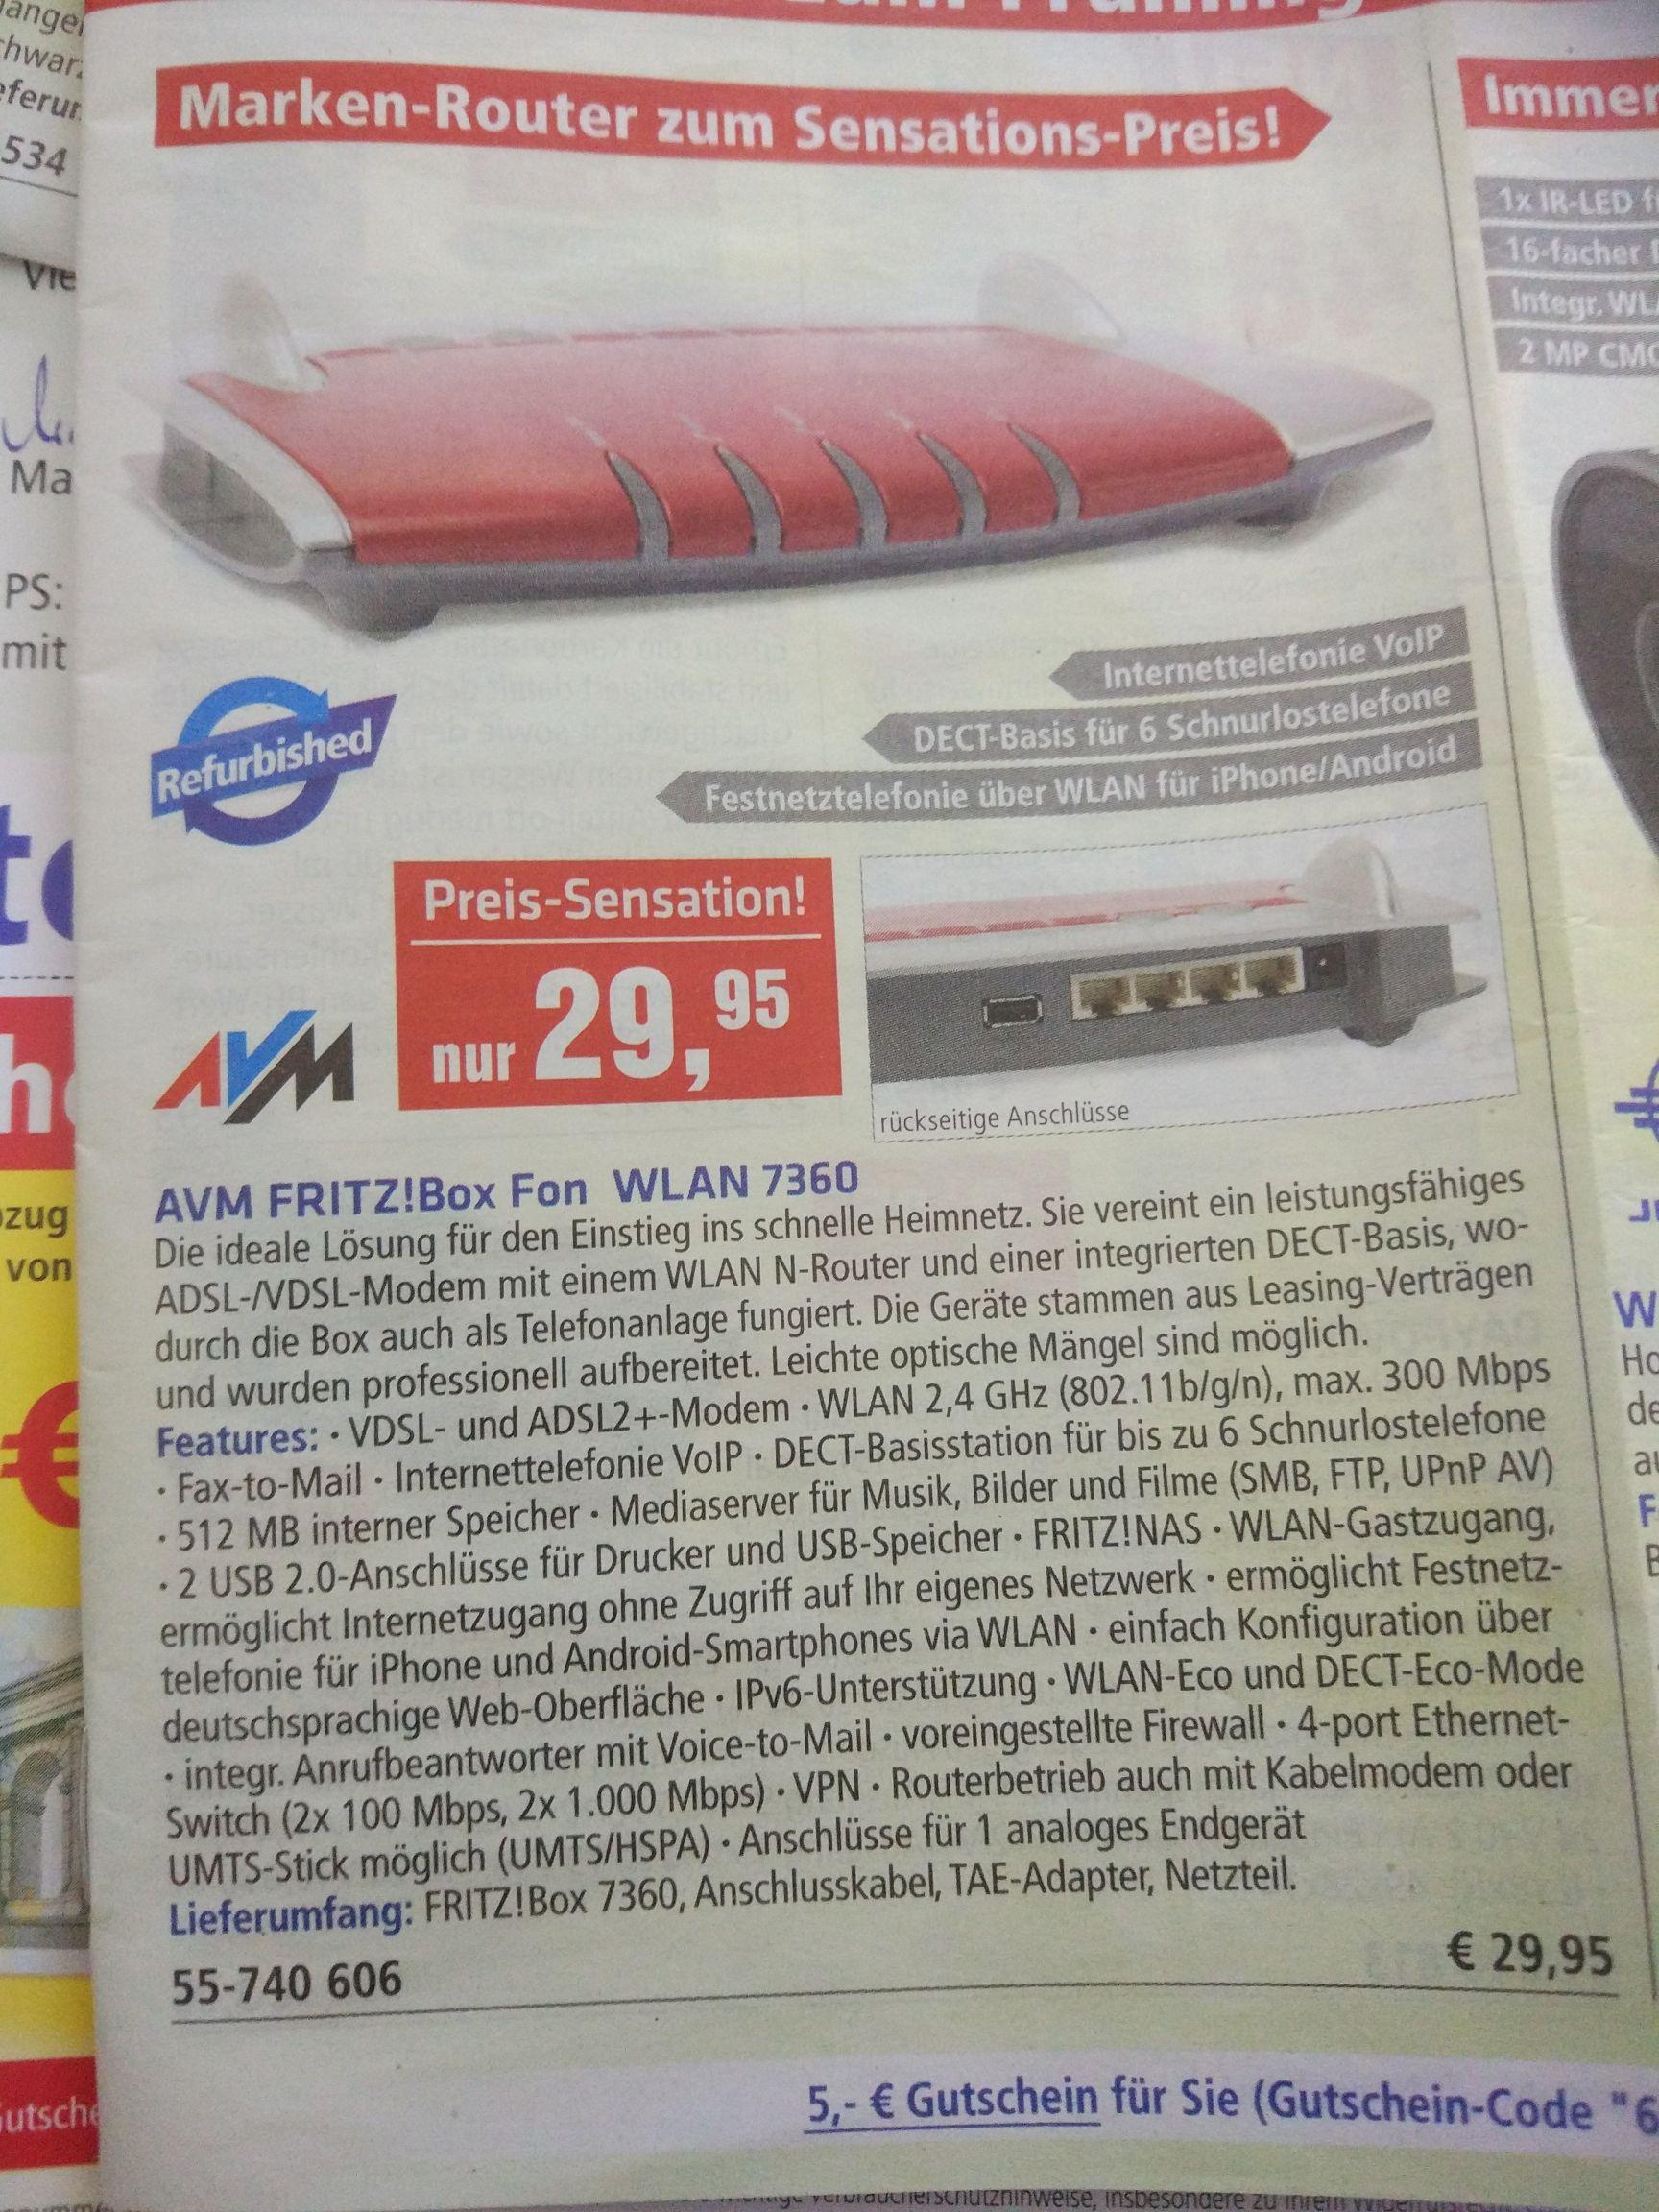 AVM FRITZ!Box 7360 (Refurbished) VDSL VoIP Modem Router bei Pollin